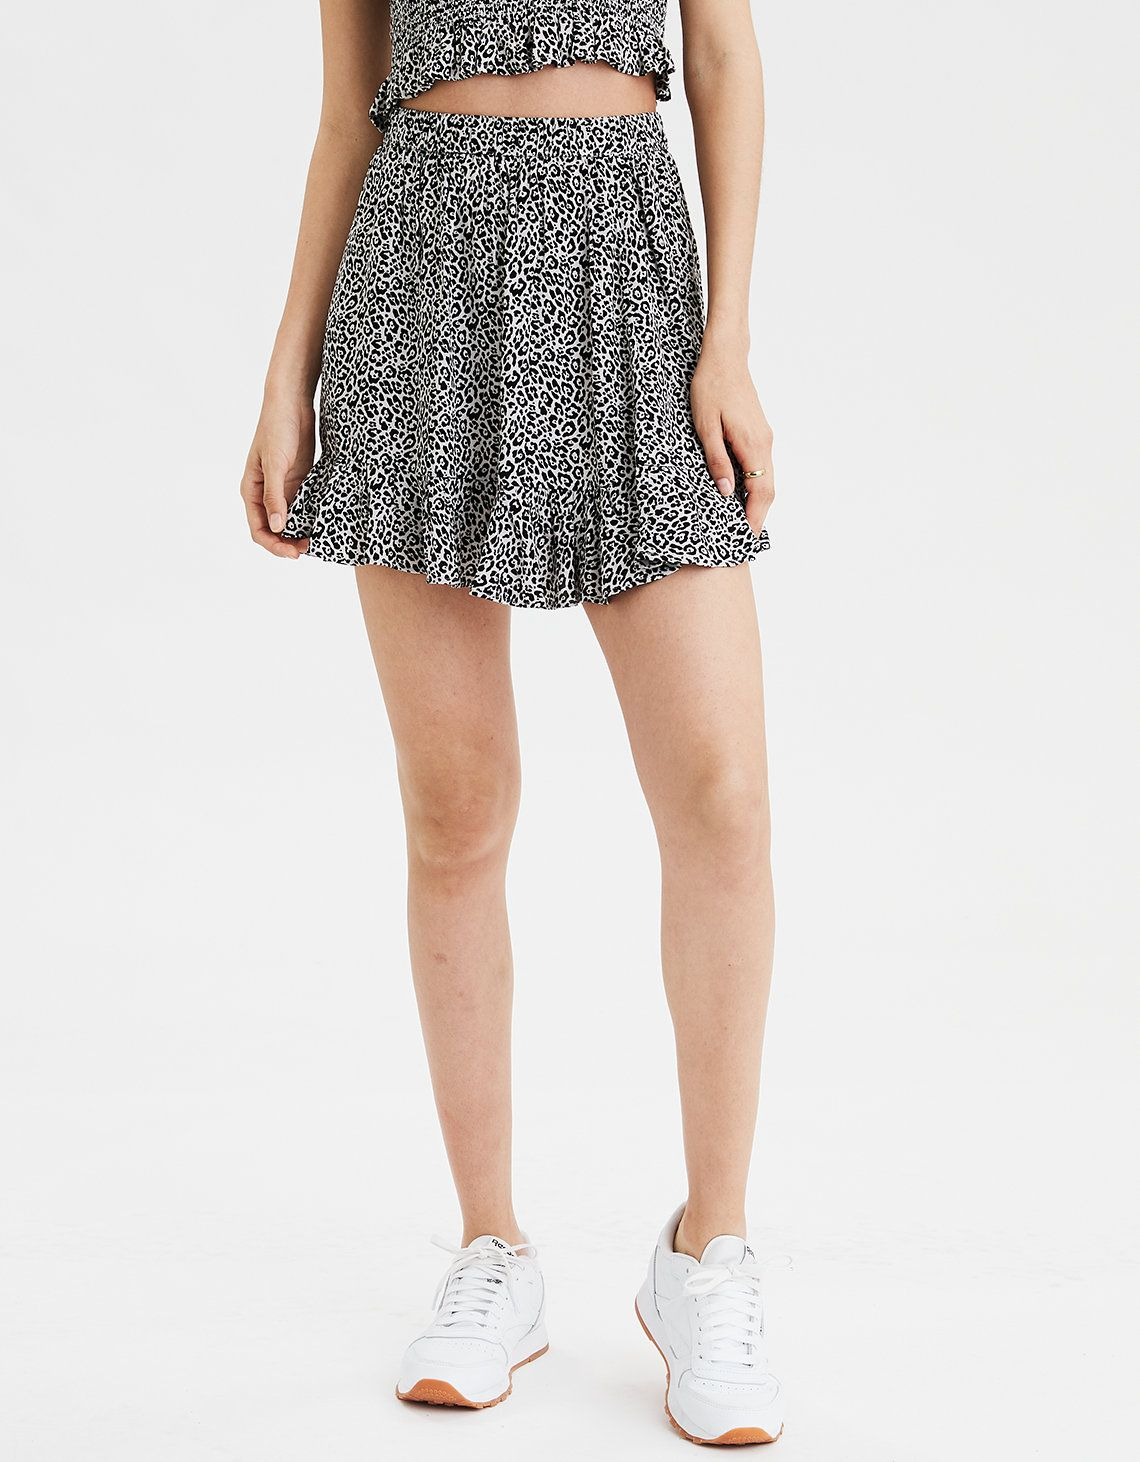 American Apparel Stretch Cotton High Waist Skater Skirt Watermelon Coral S NEW